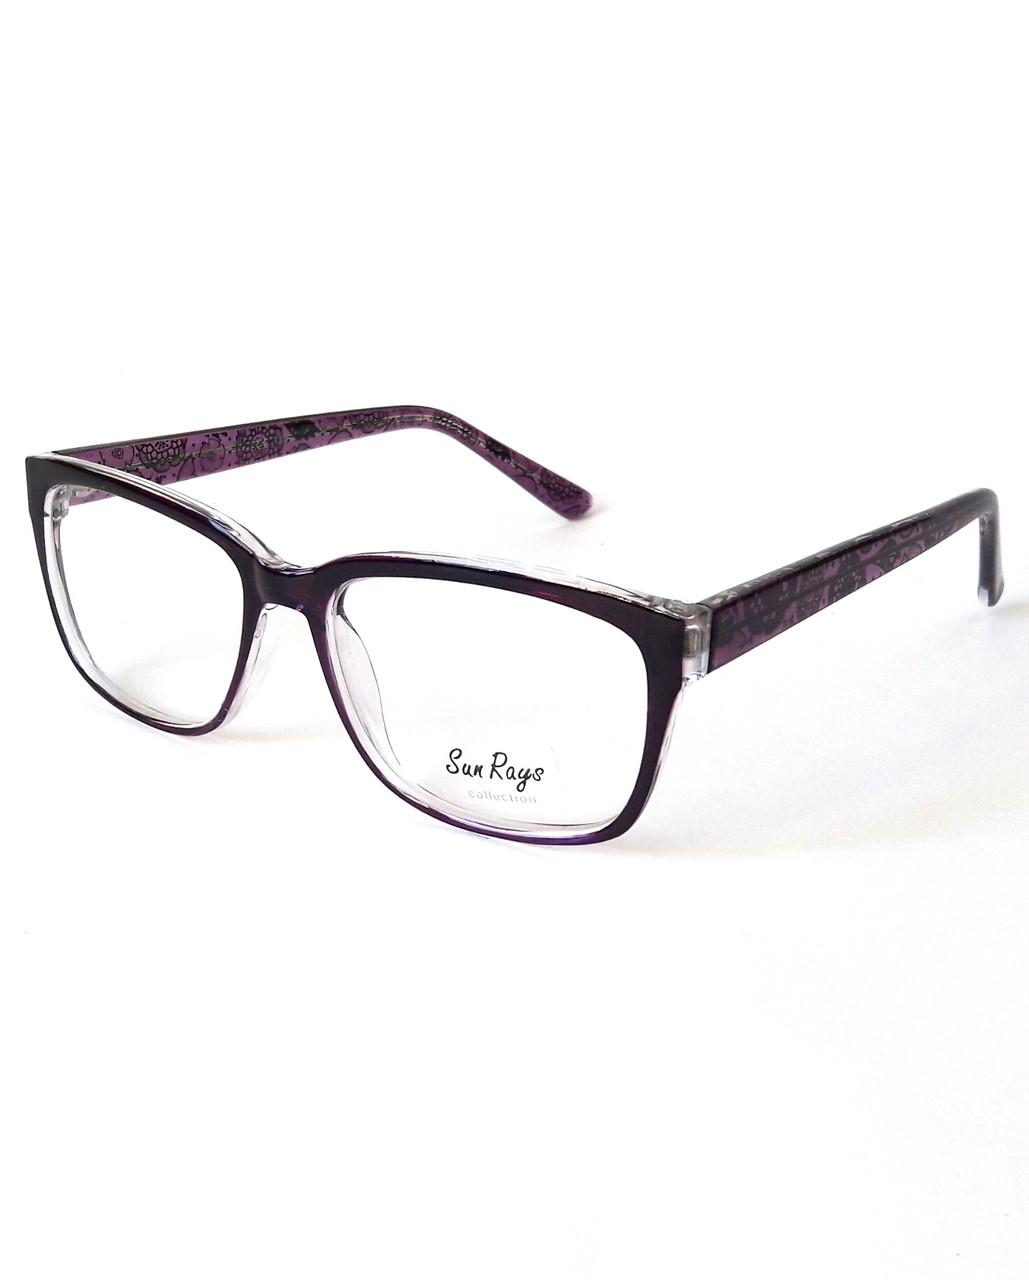 Оправа двухцветная, нарядная, чёрно-фиолетовая, глянцевая, пластиковая, женская, Sun Rays